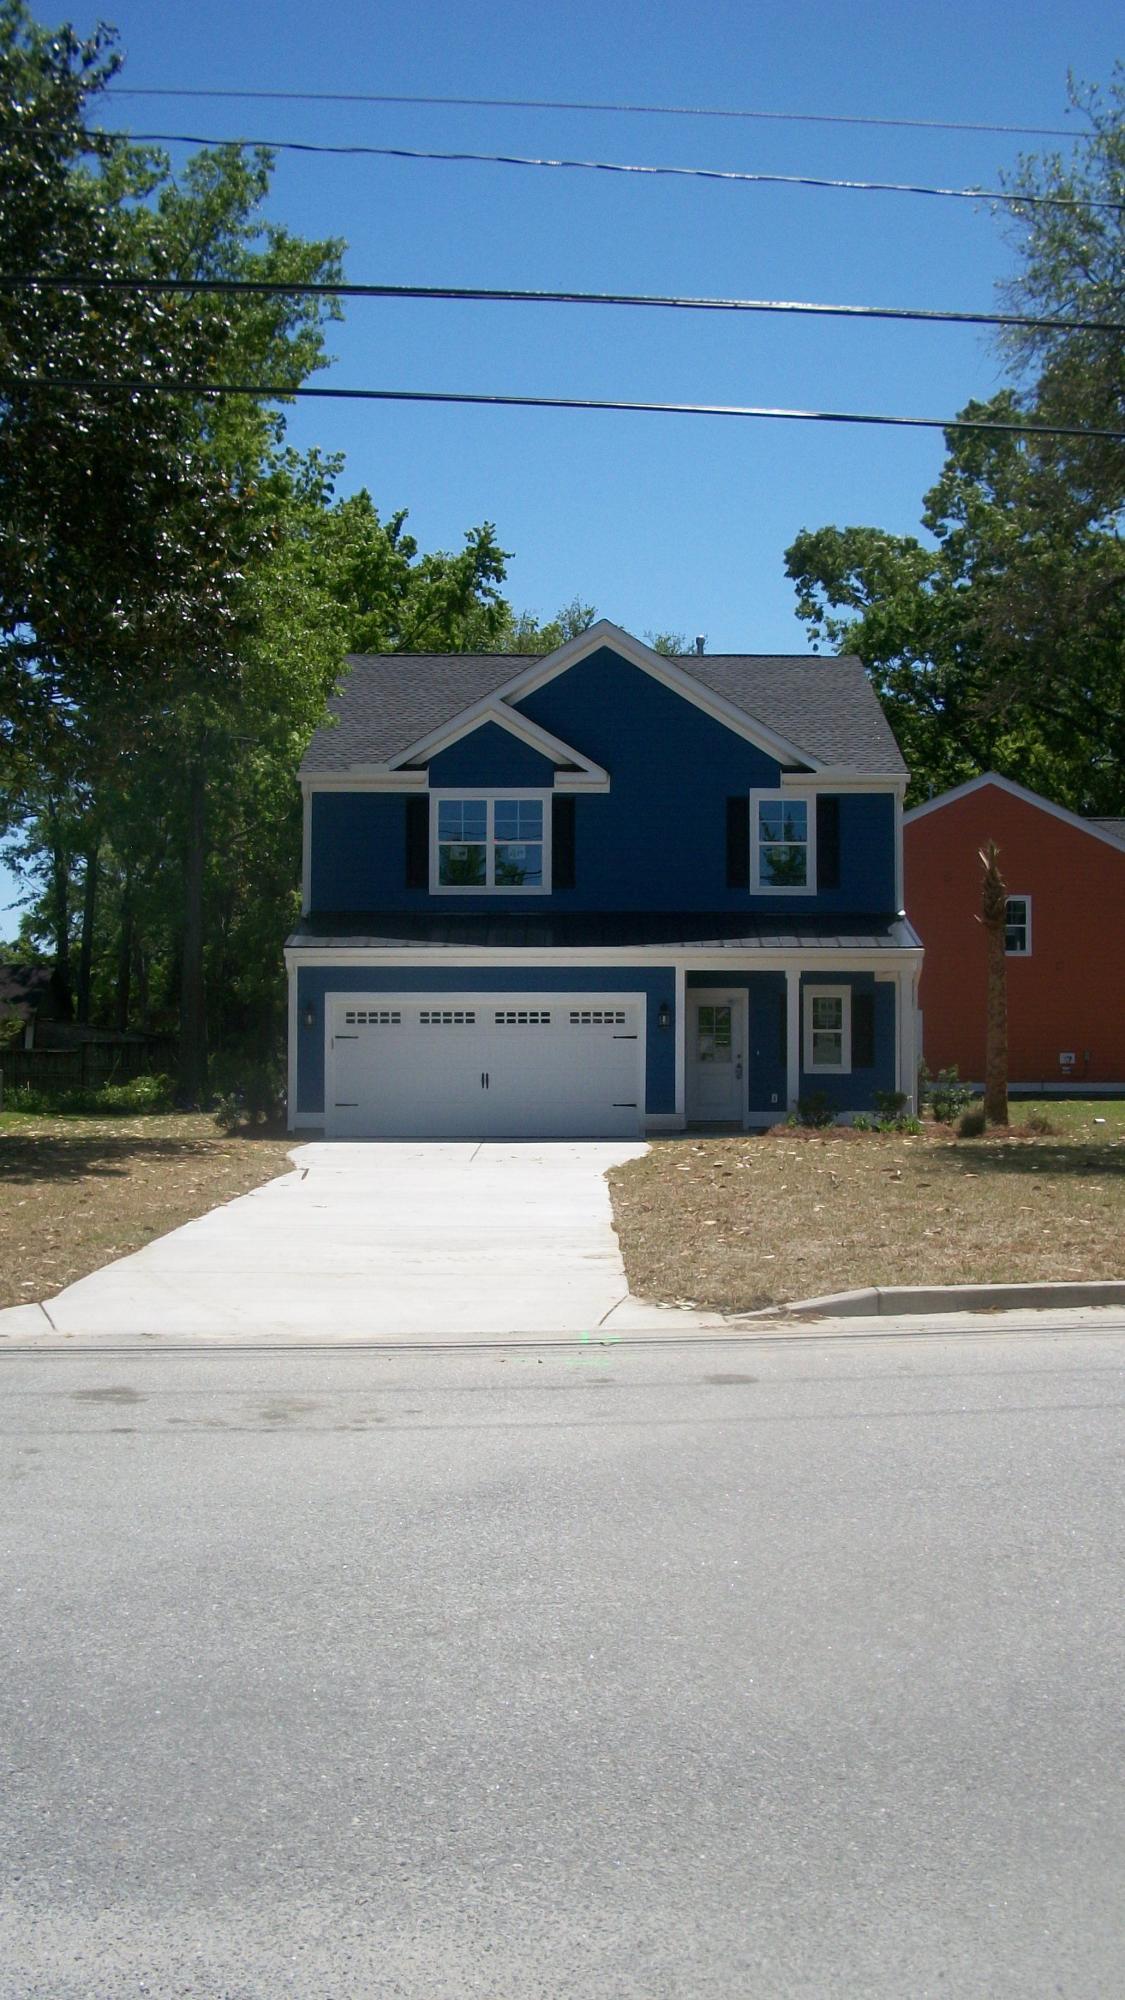 Filbin Creek Homes For Sale - 1173 Sumner, North Charleston, SC - 1